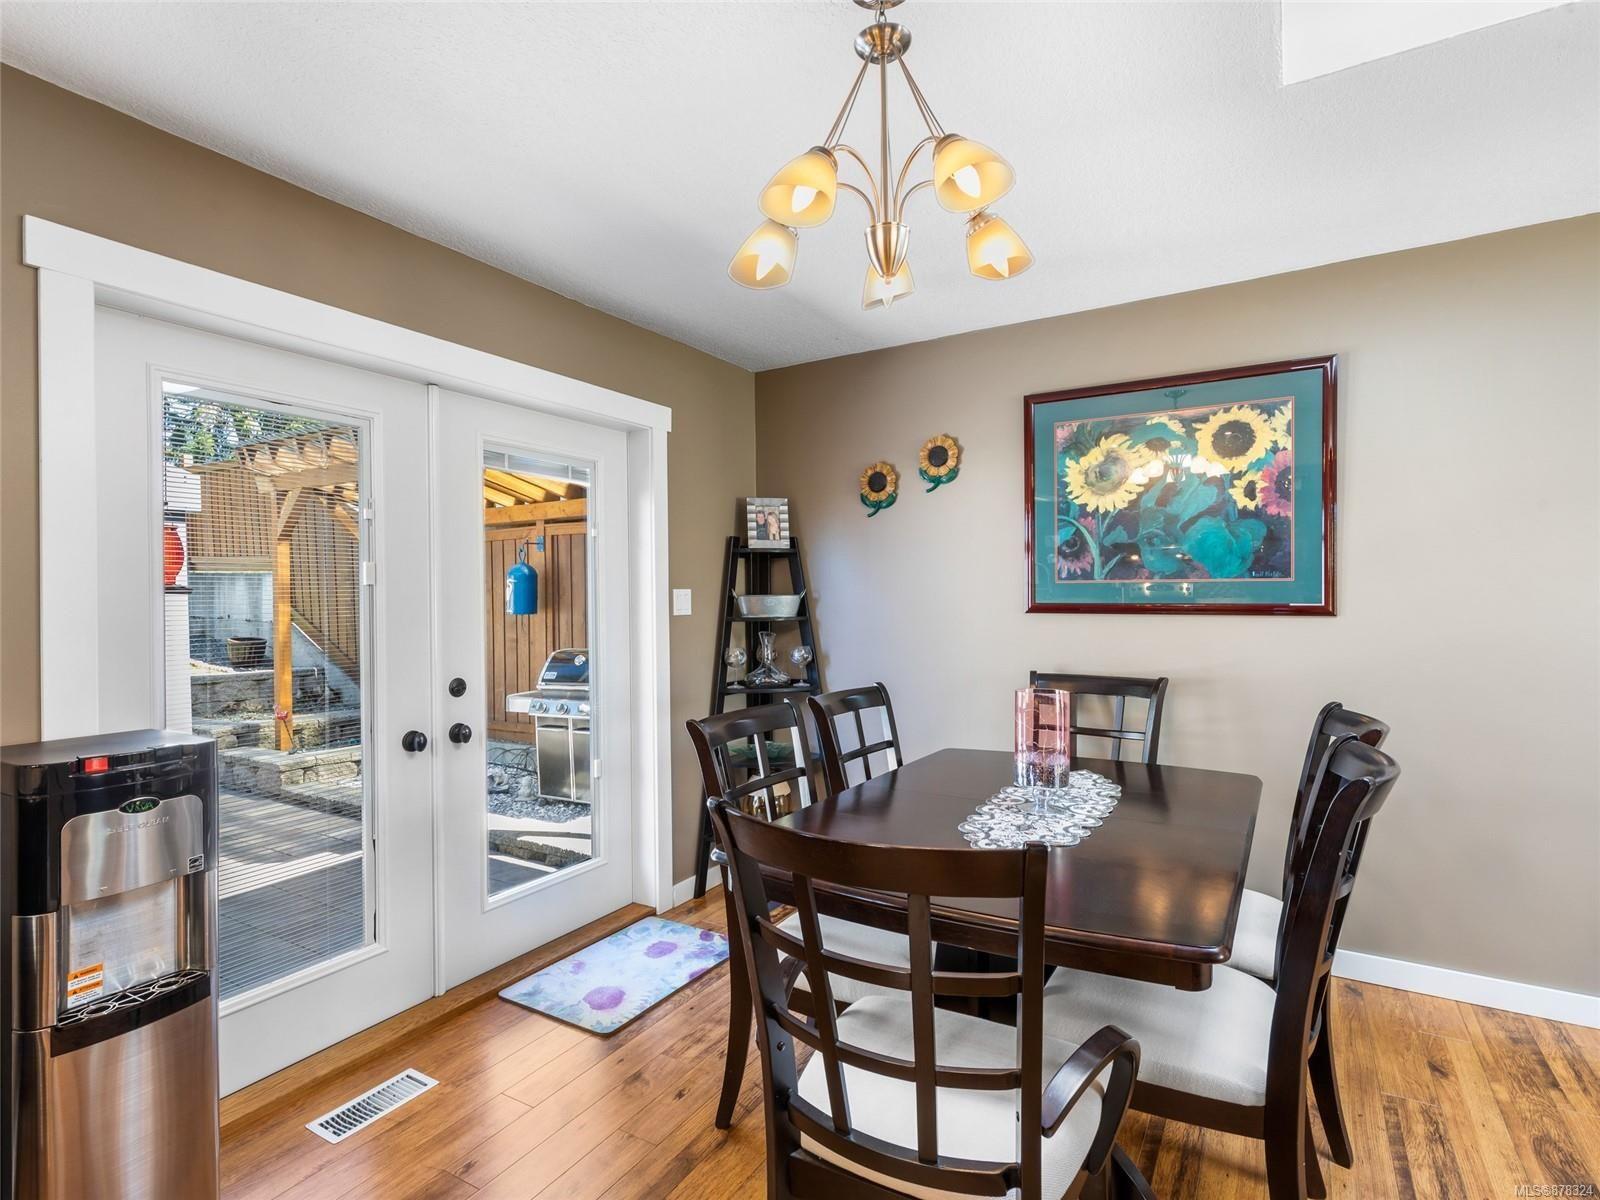 Photo 22: Photos: 3875 Moore Rd in : PA Port Alberni House for sale (Port Alberni)  : MLS®# 878324